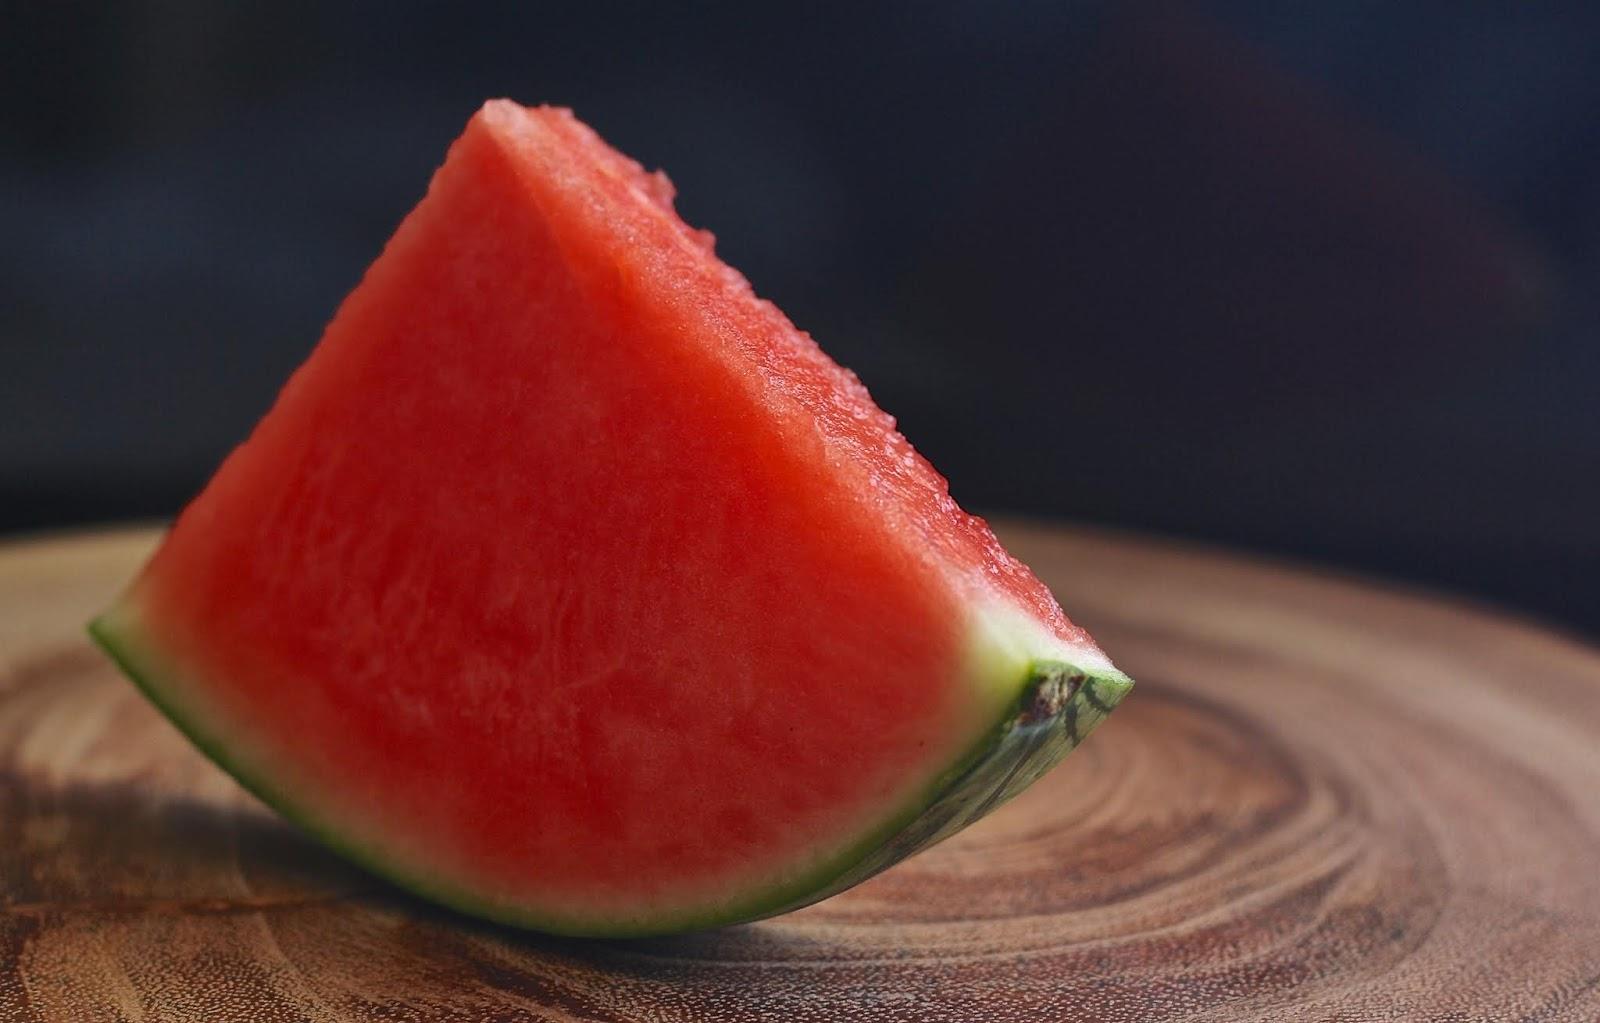 तरबूज के 9 अद्भुत लाभ   9 Amazing Benefits Of Watermelon in Hindi